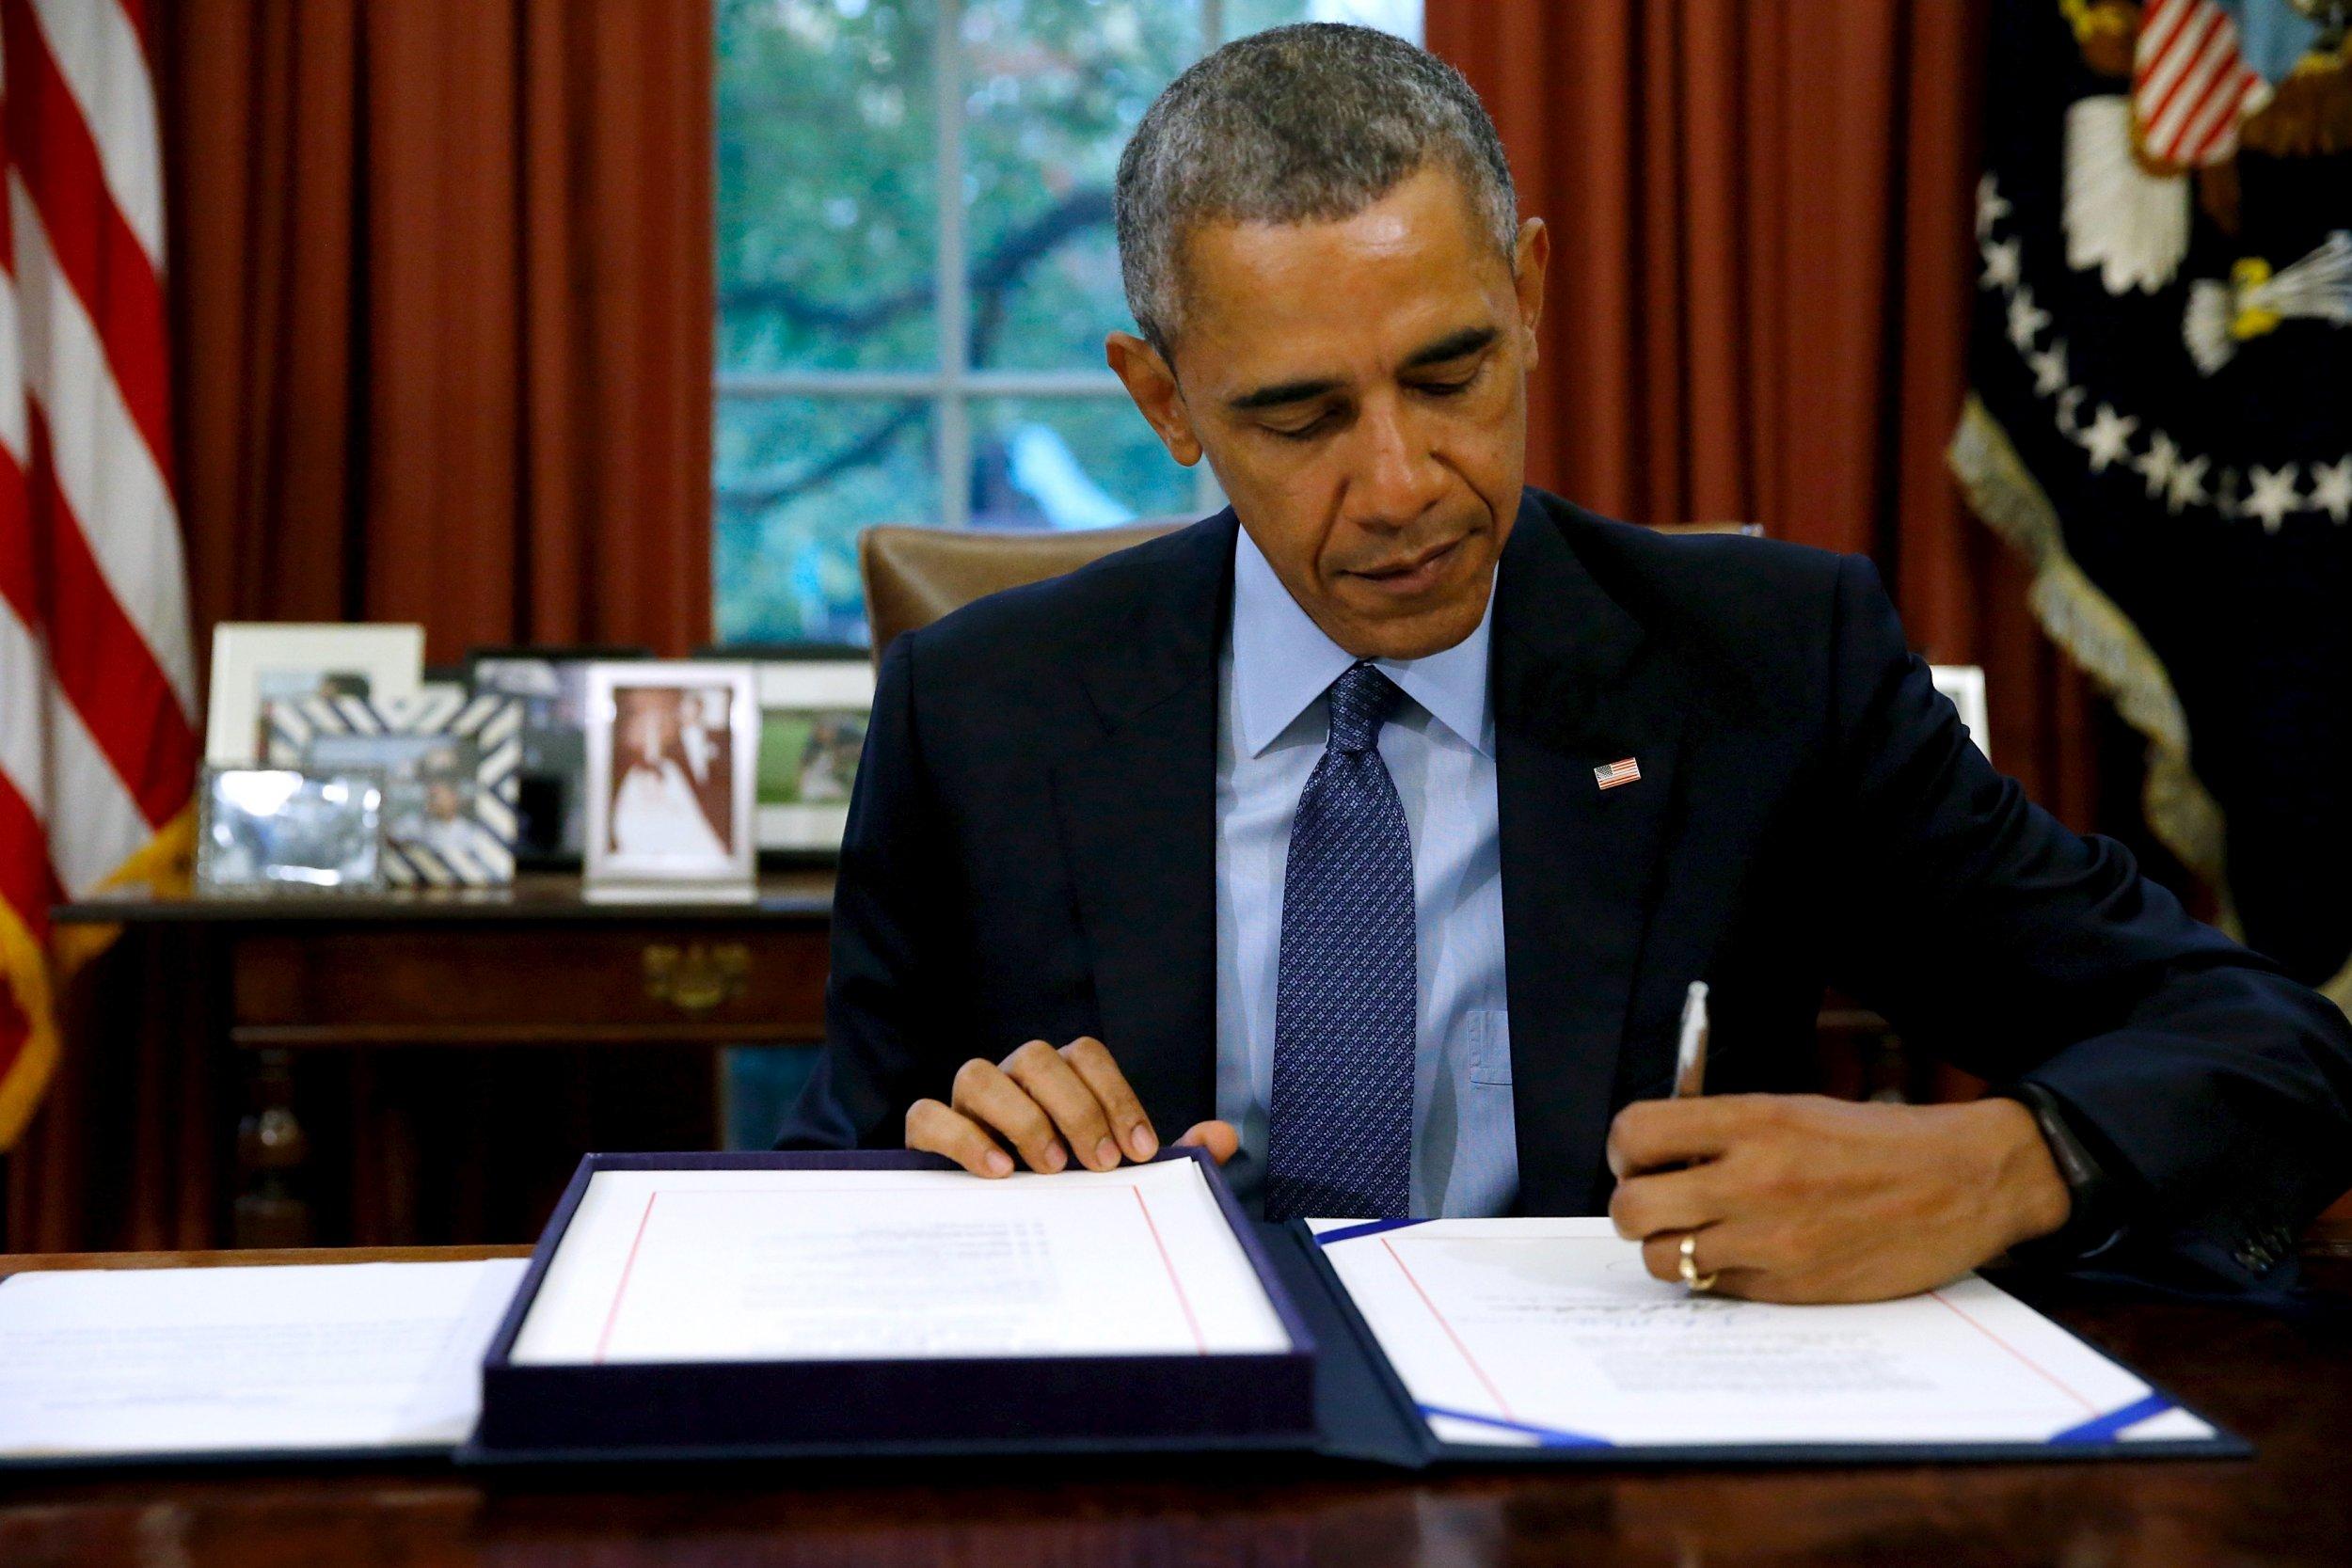 11_02_Obama_Budget_Deal_01